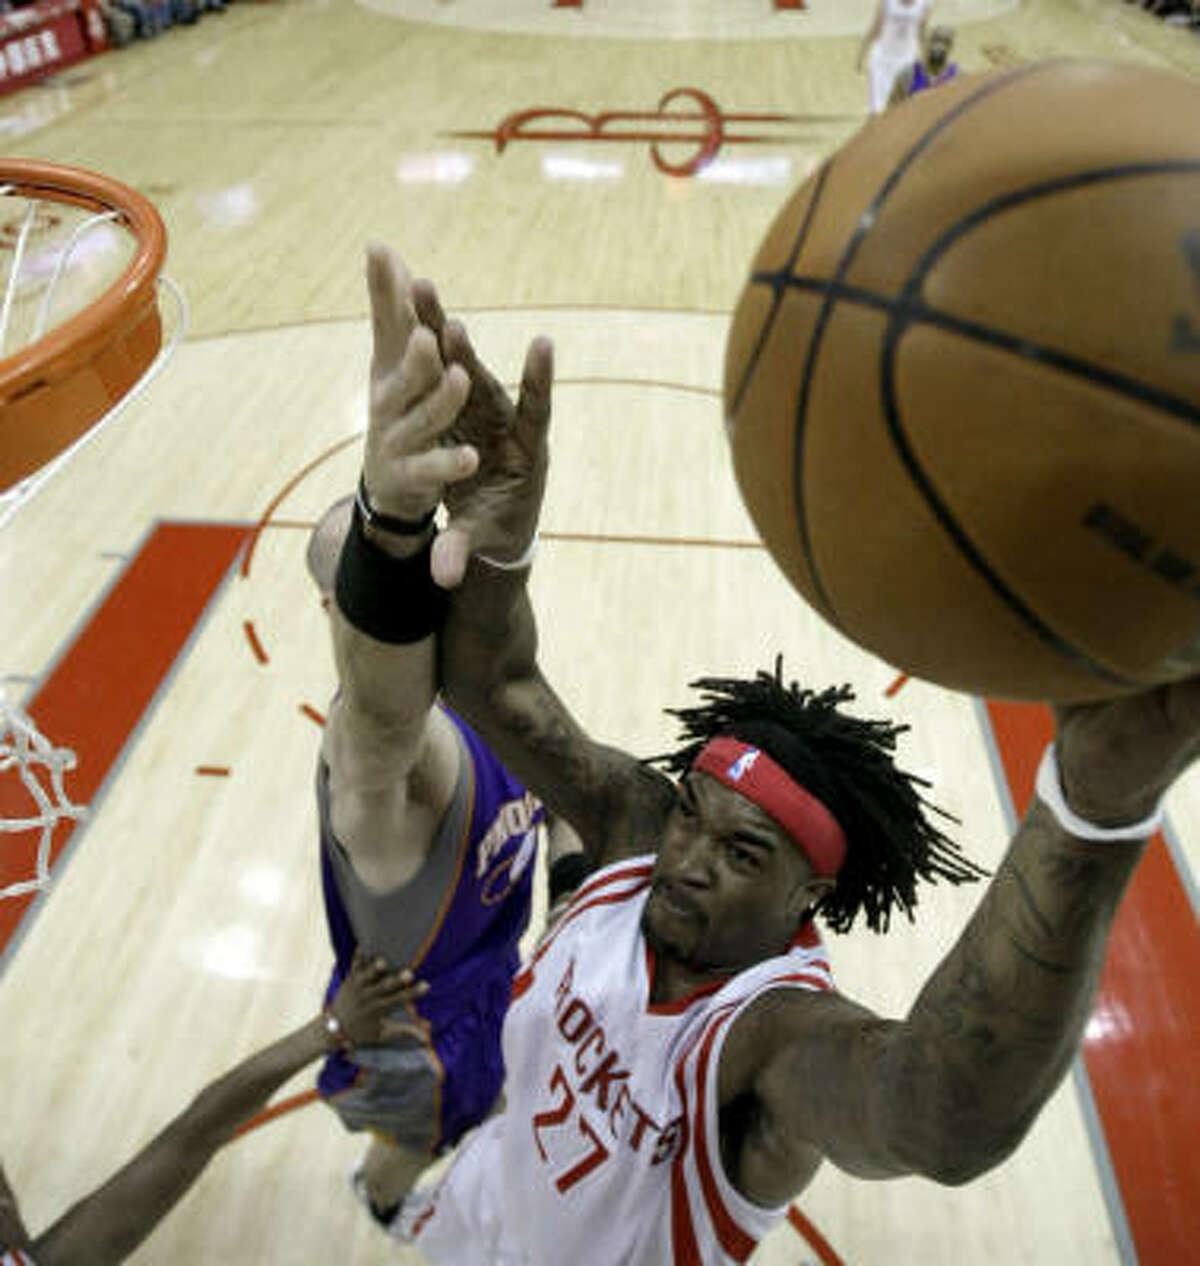 Rockets' Jordan Hill (27) goes up for a shot as Suns' Marcin Gortat, left, defends.